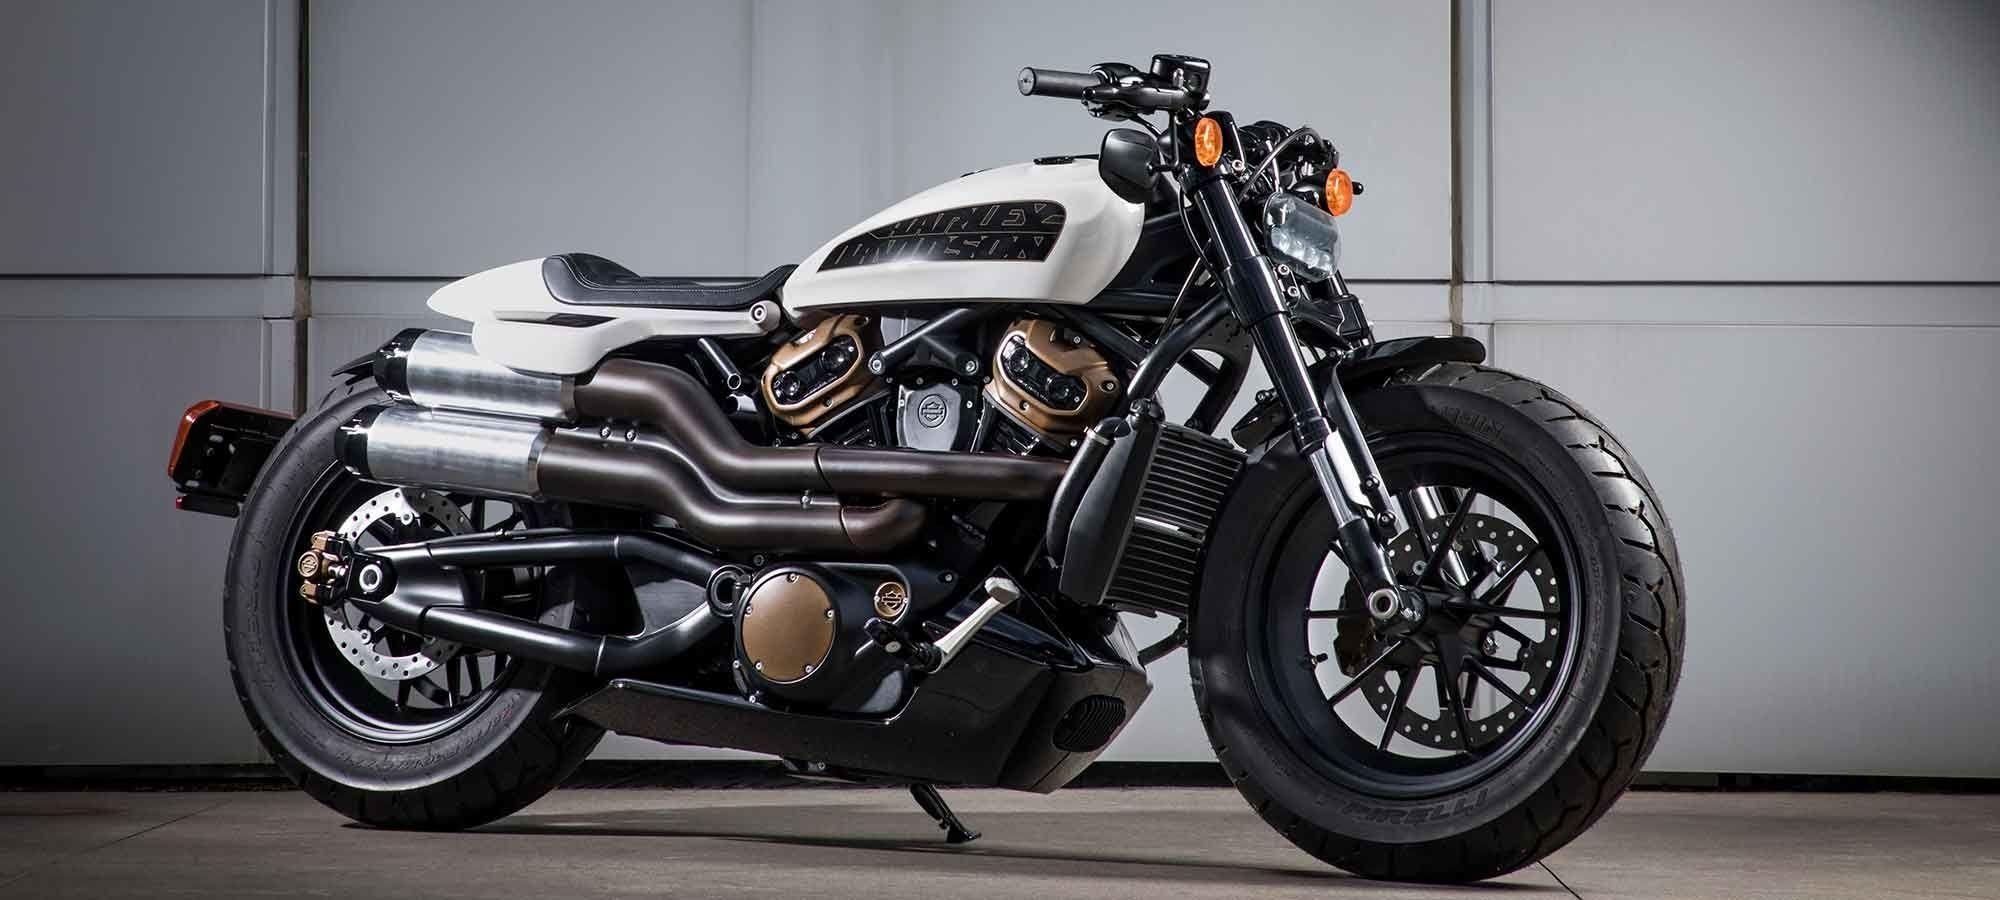 The New Sportster 2020 Harley Davidson 1 250cc Custom Preview